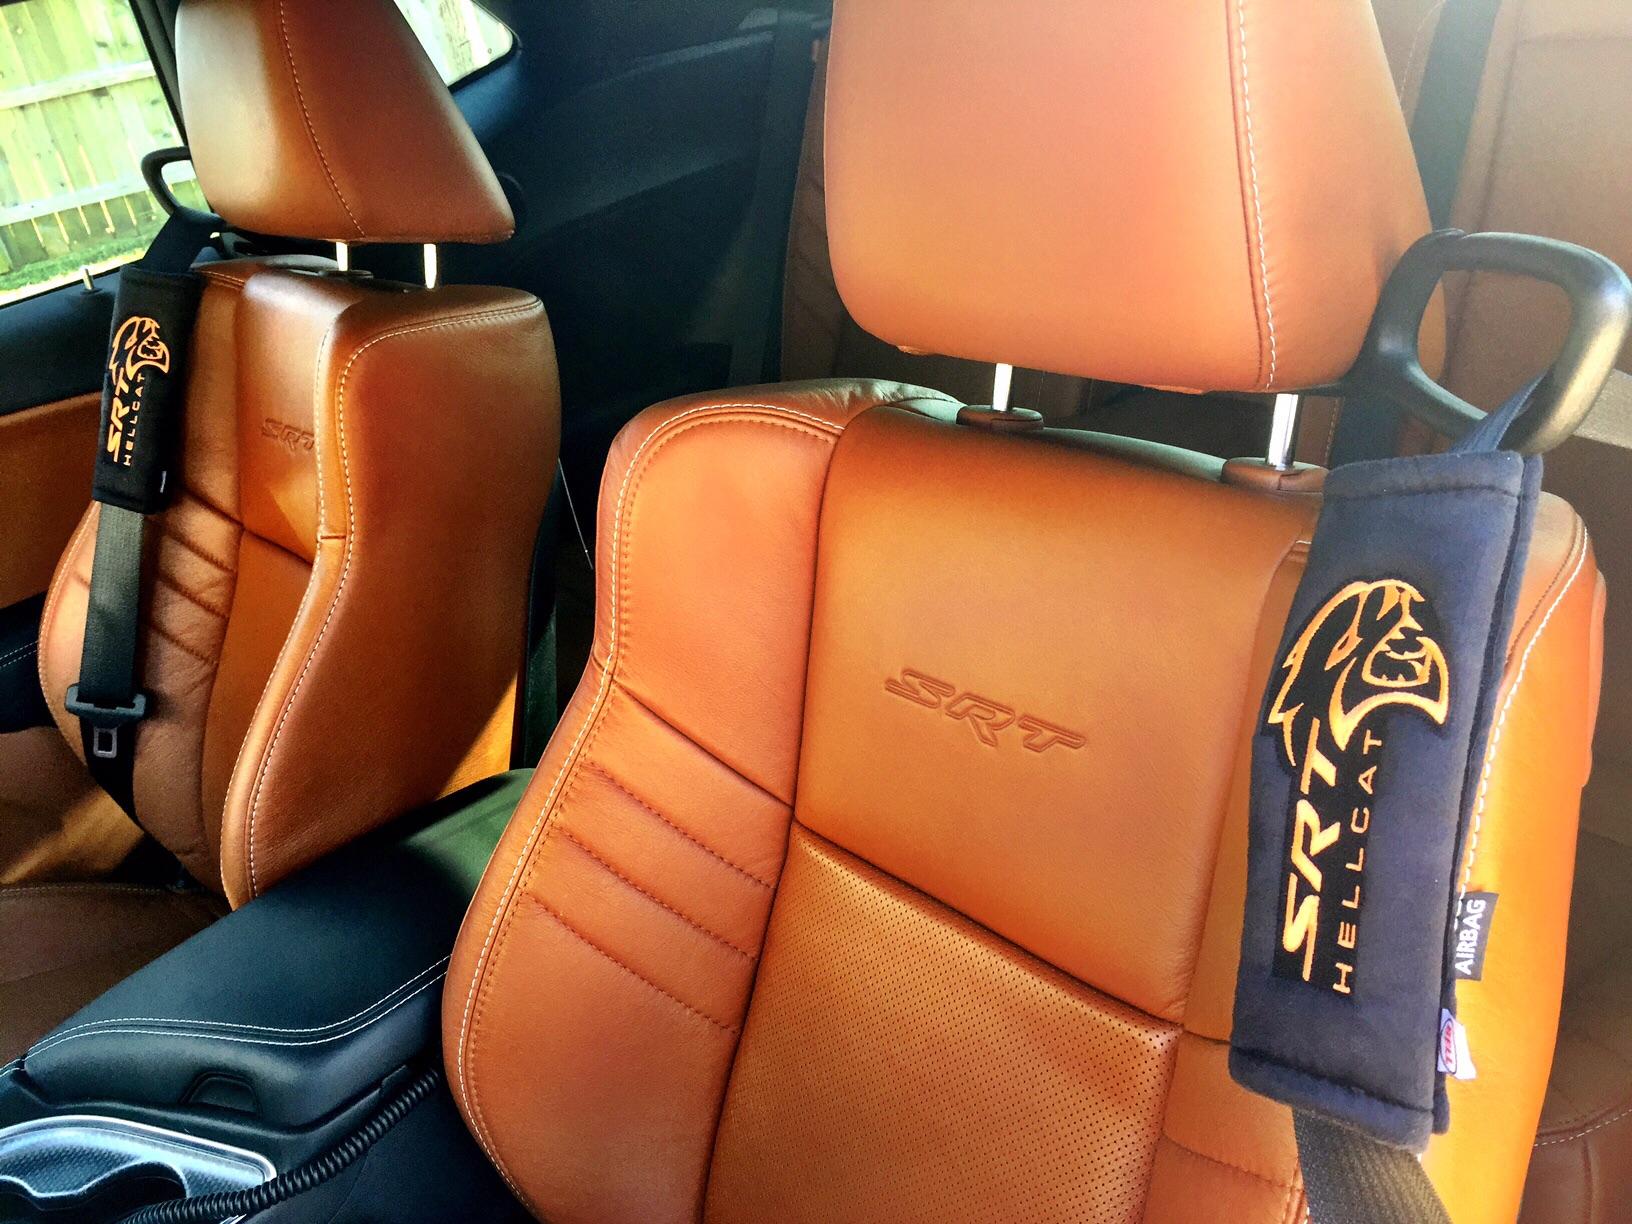 vehicle challenger srt hellcat imagejpg - 2015 Dodge Challenger Srt Hellcat Sepia Laguna Leather